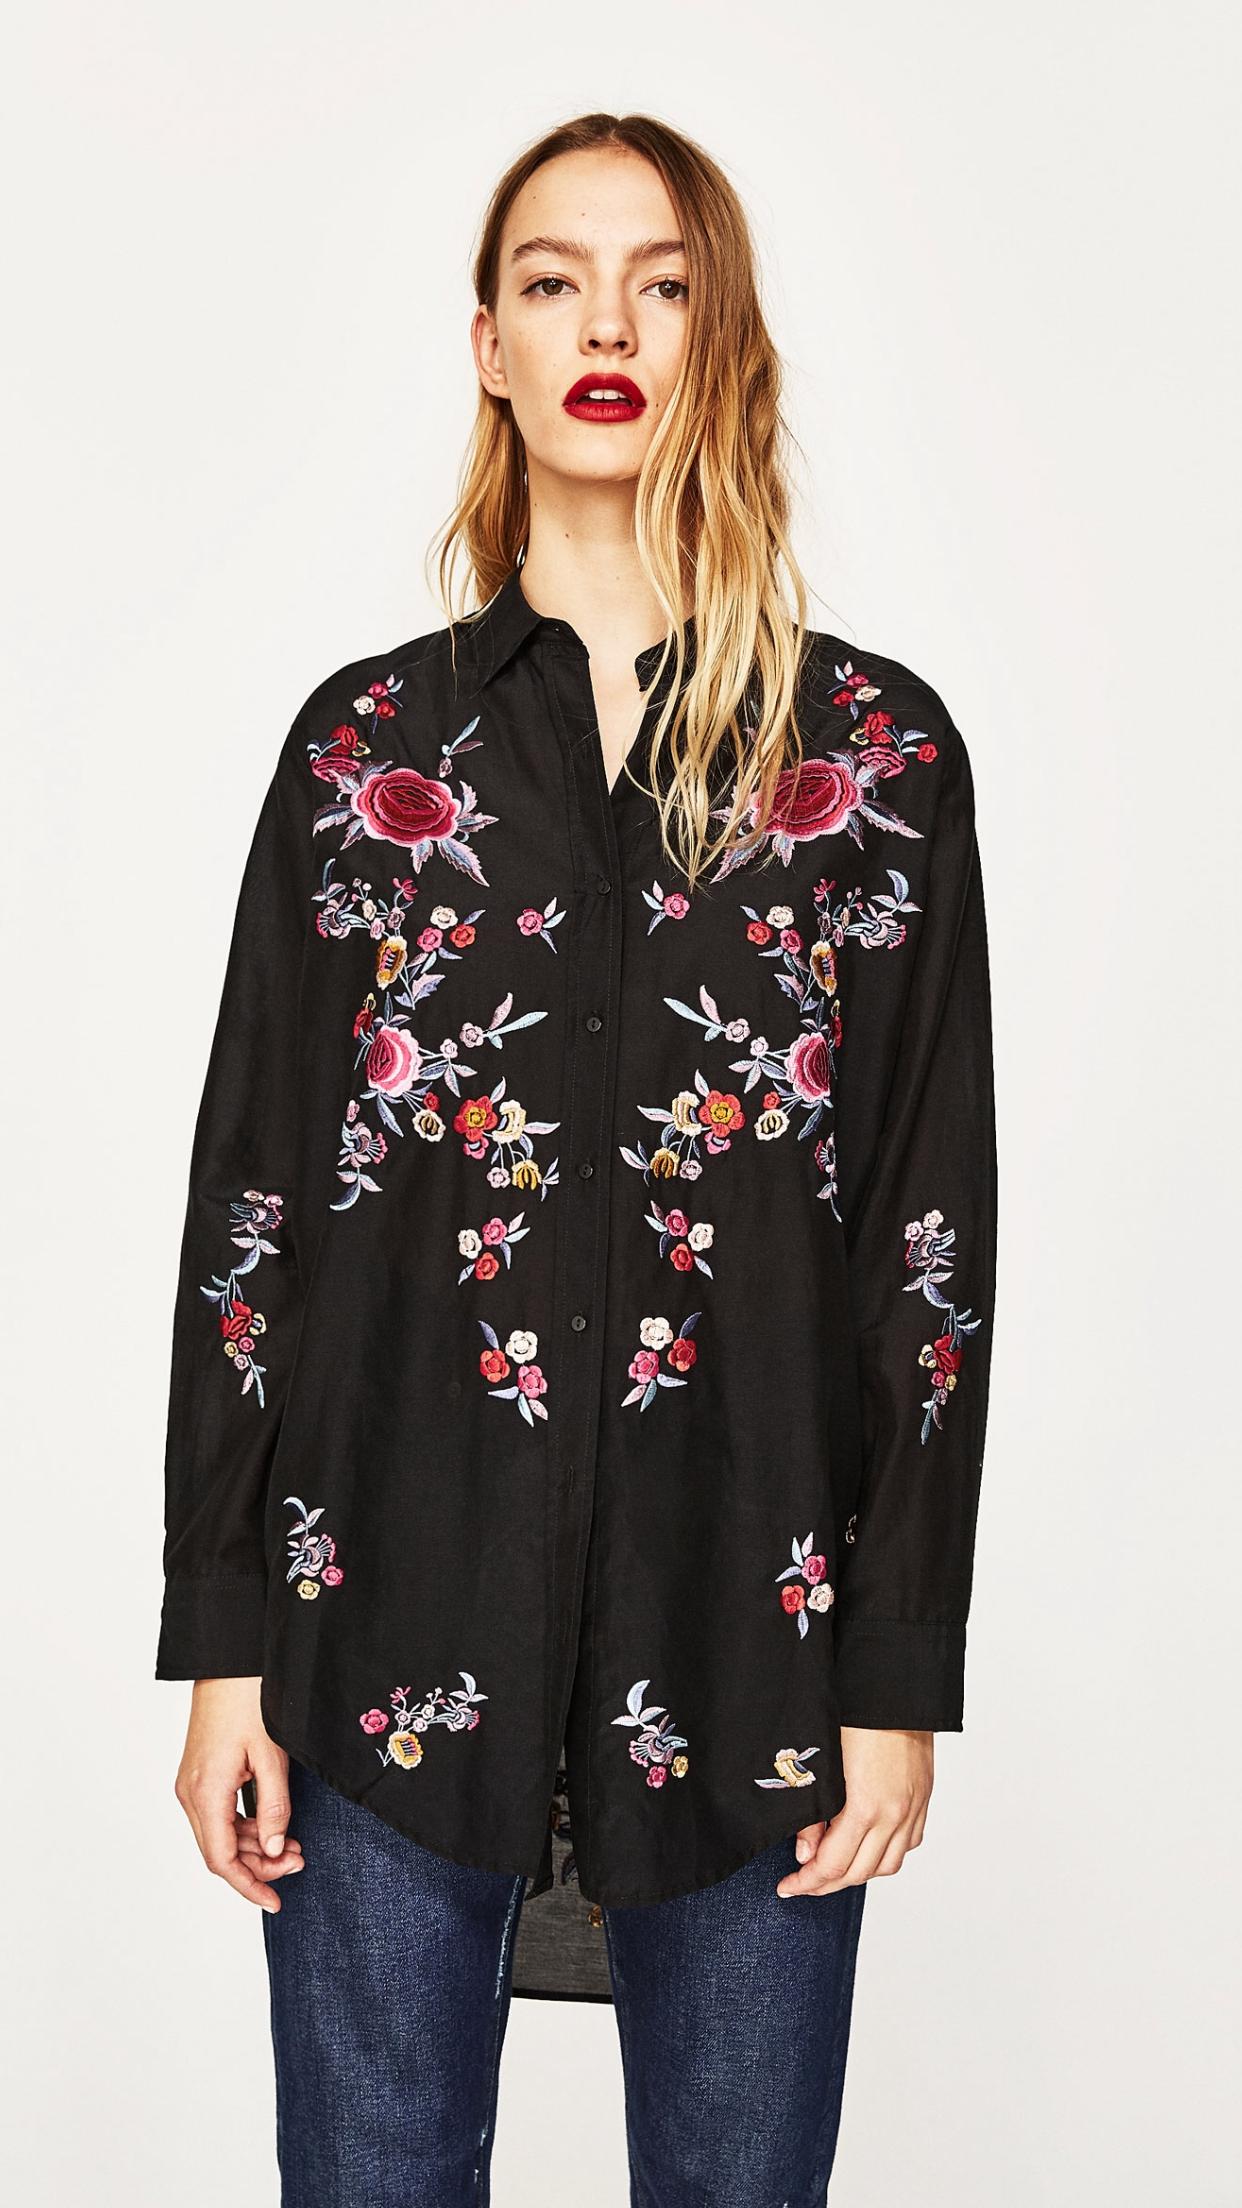 3285e2e5f3710 Zara black embroidered shirt | Mesion in 2019 | Oberteile, Oberteile ...